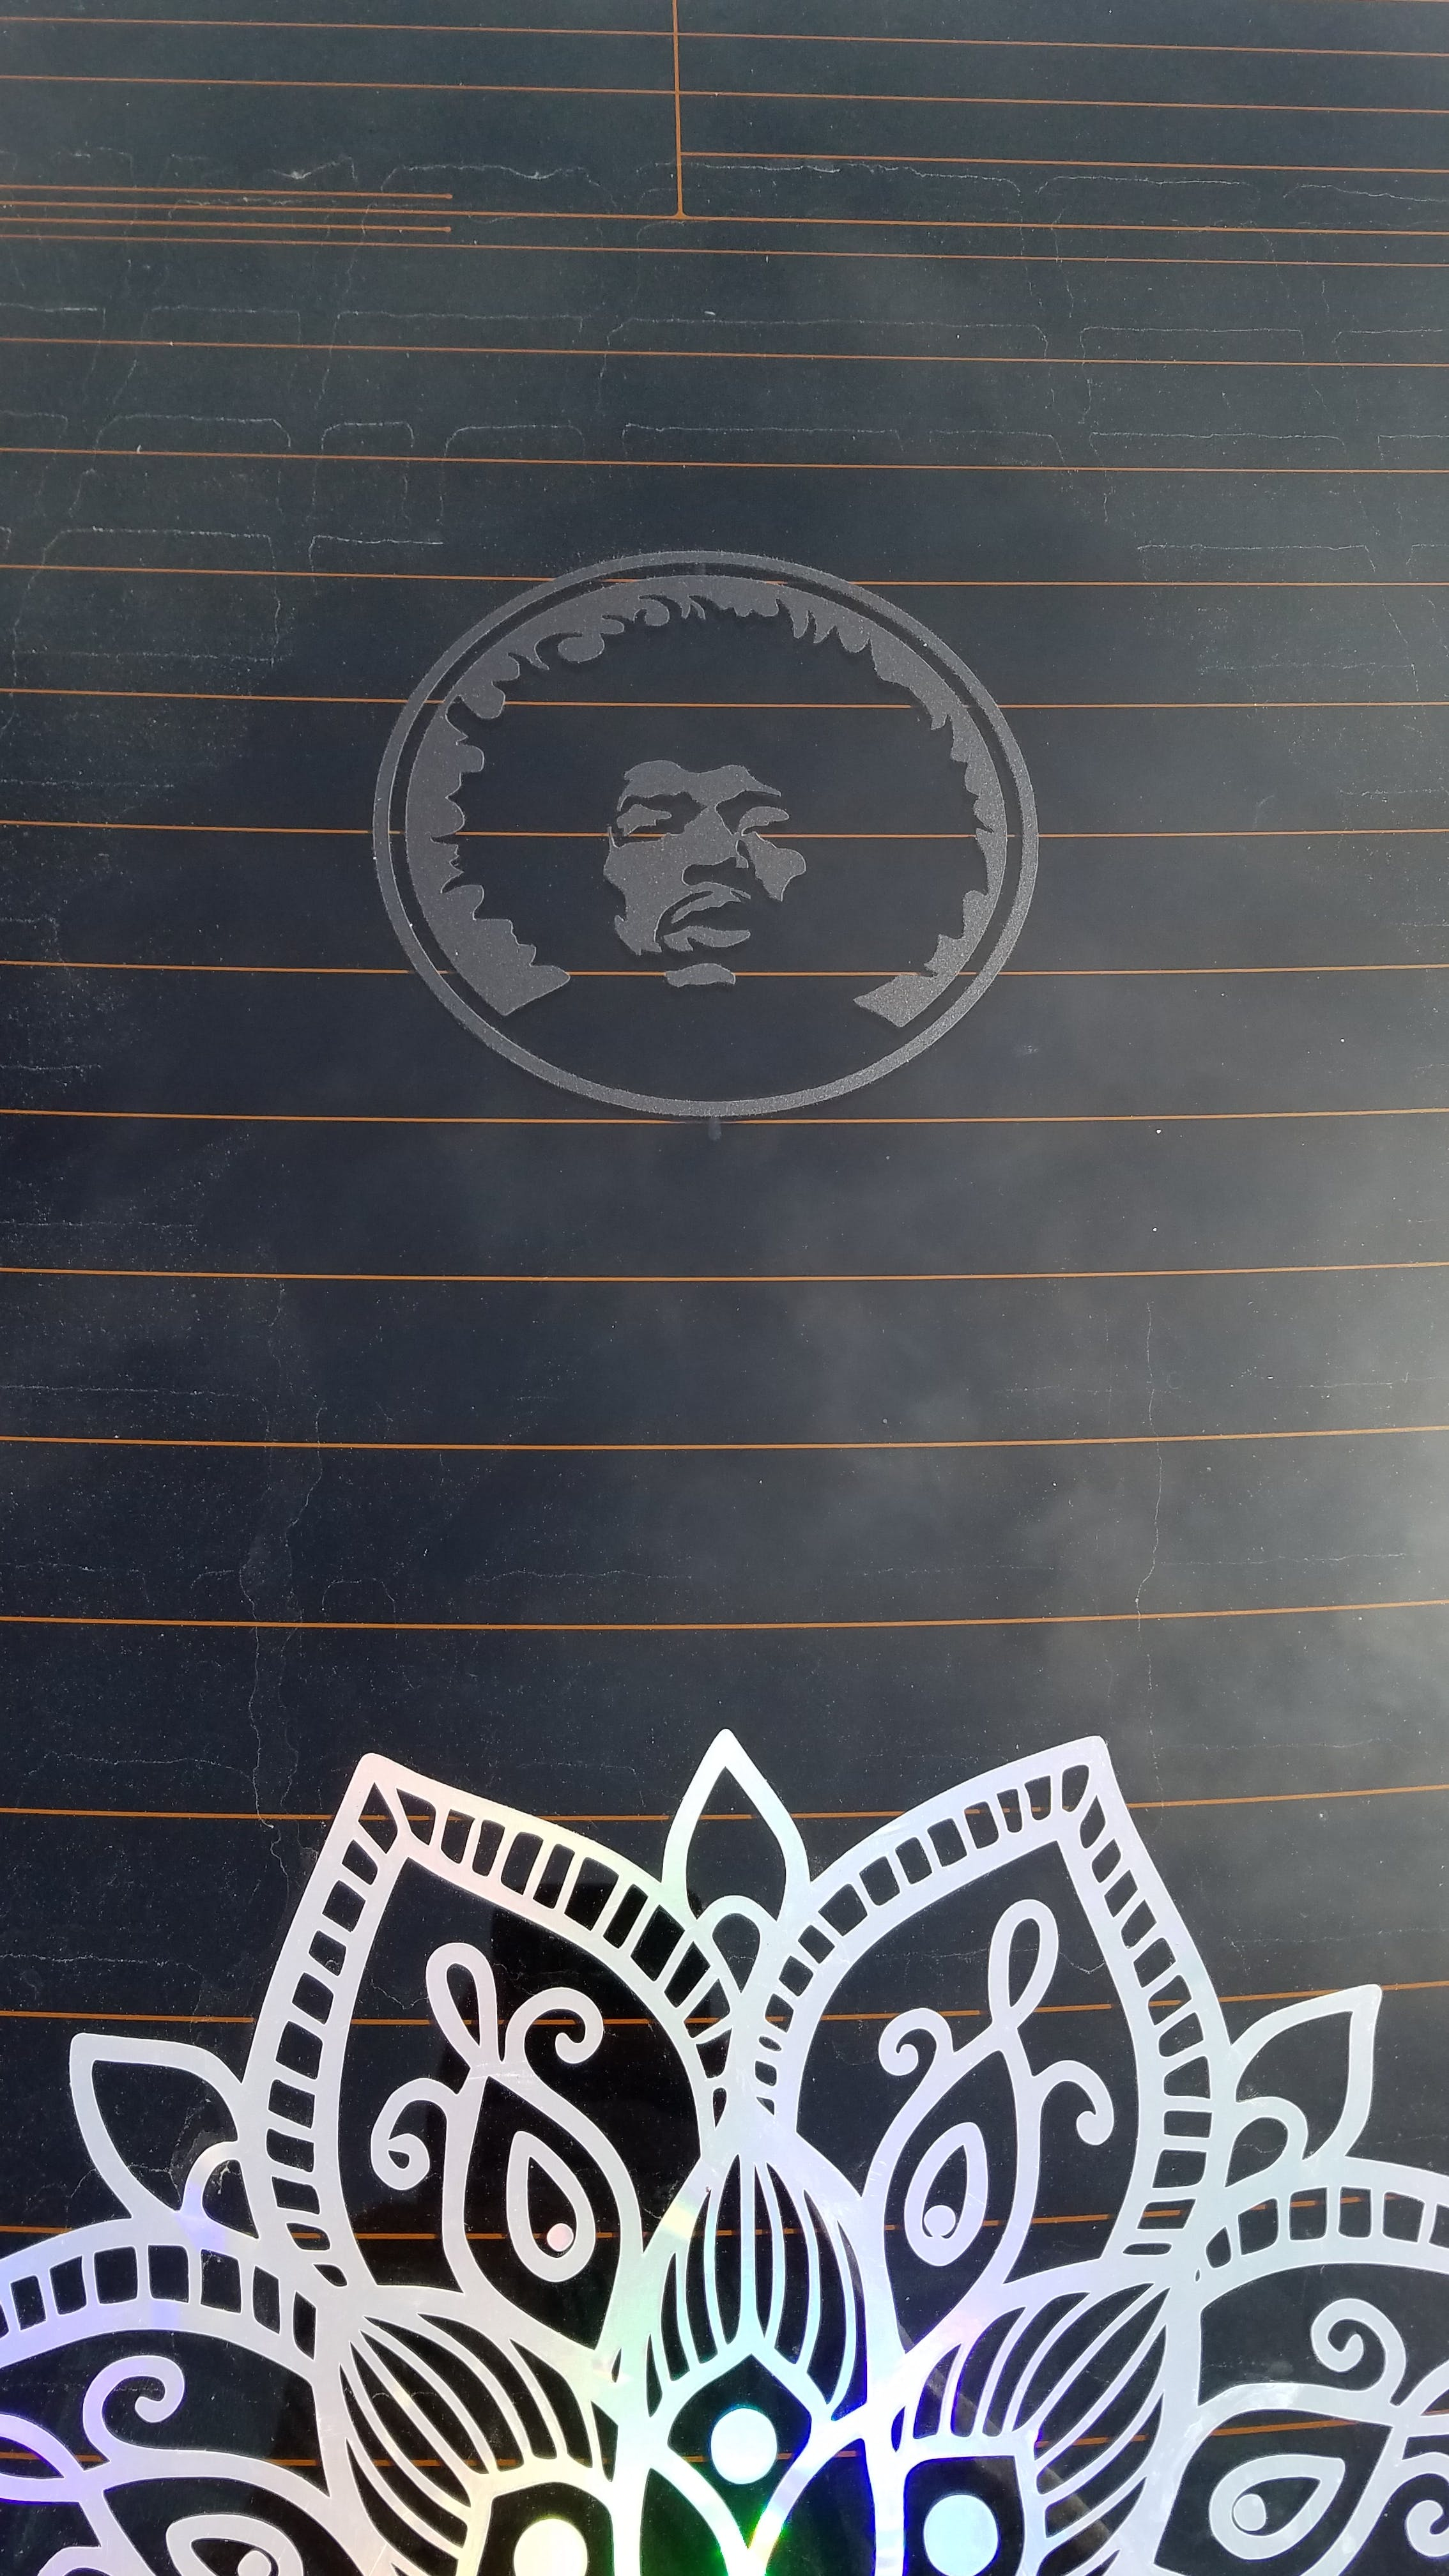 Jimi Hendrix  - Band Stickers